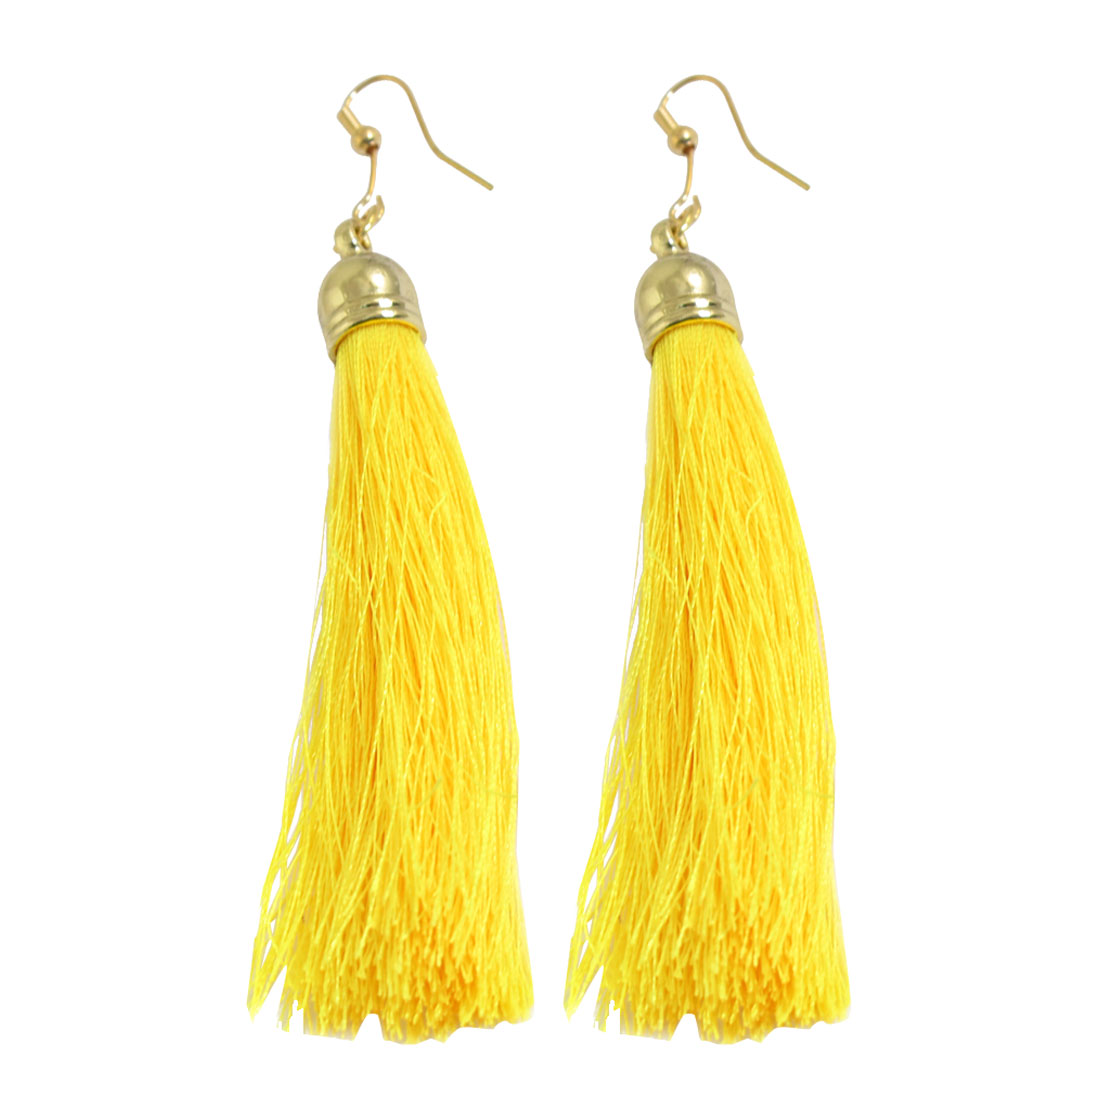 Woman Decoration Nylon Tassel Pendant Dangler Hook Earrings Yellow Pair